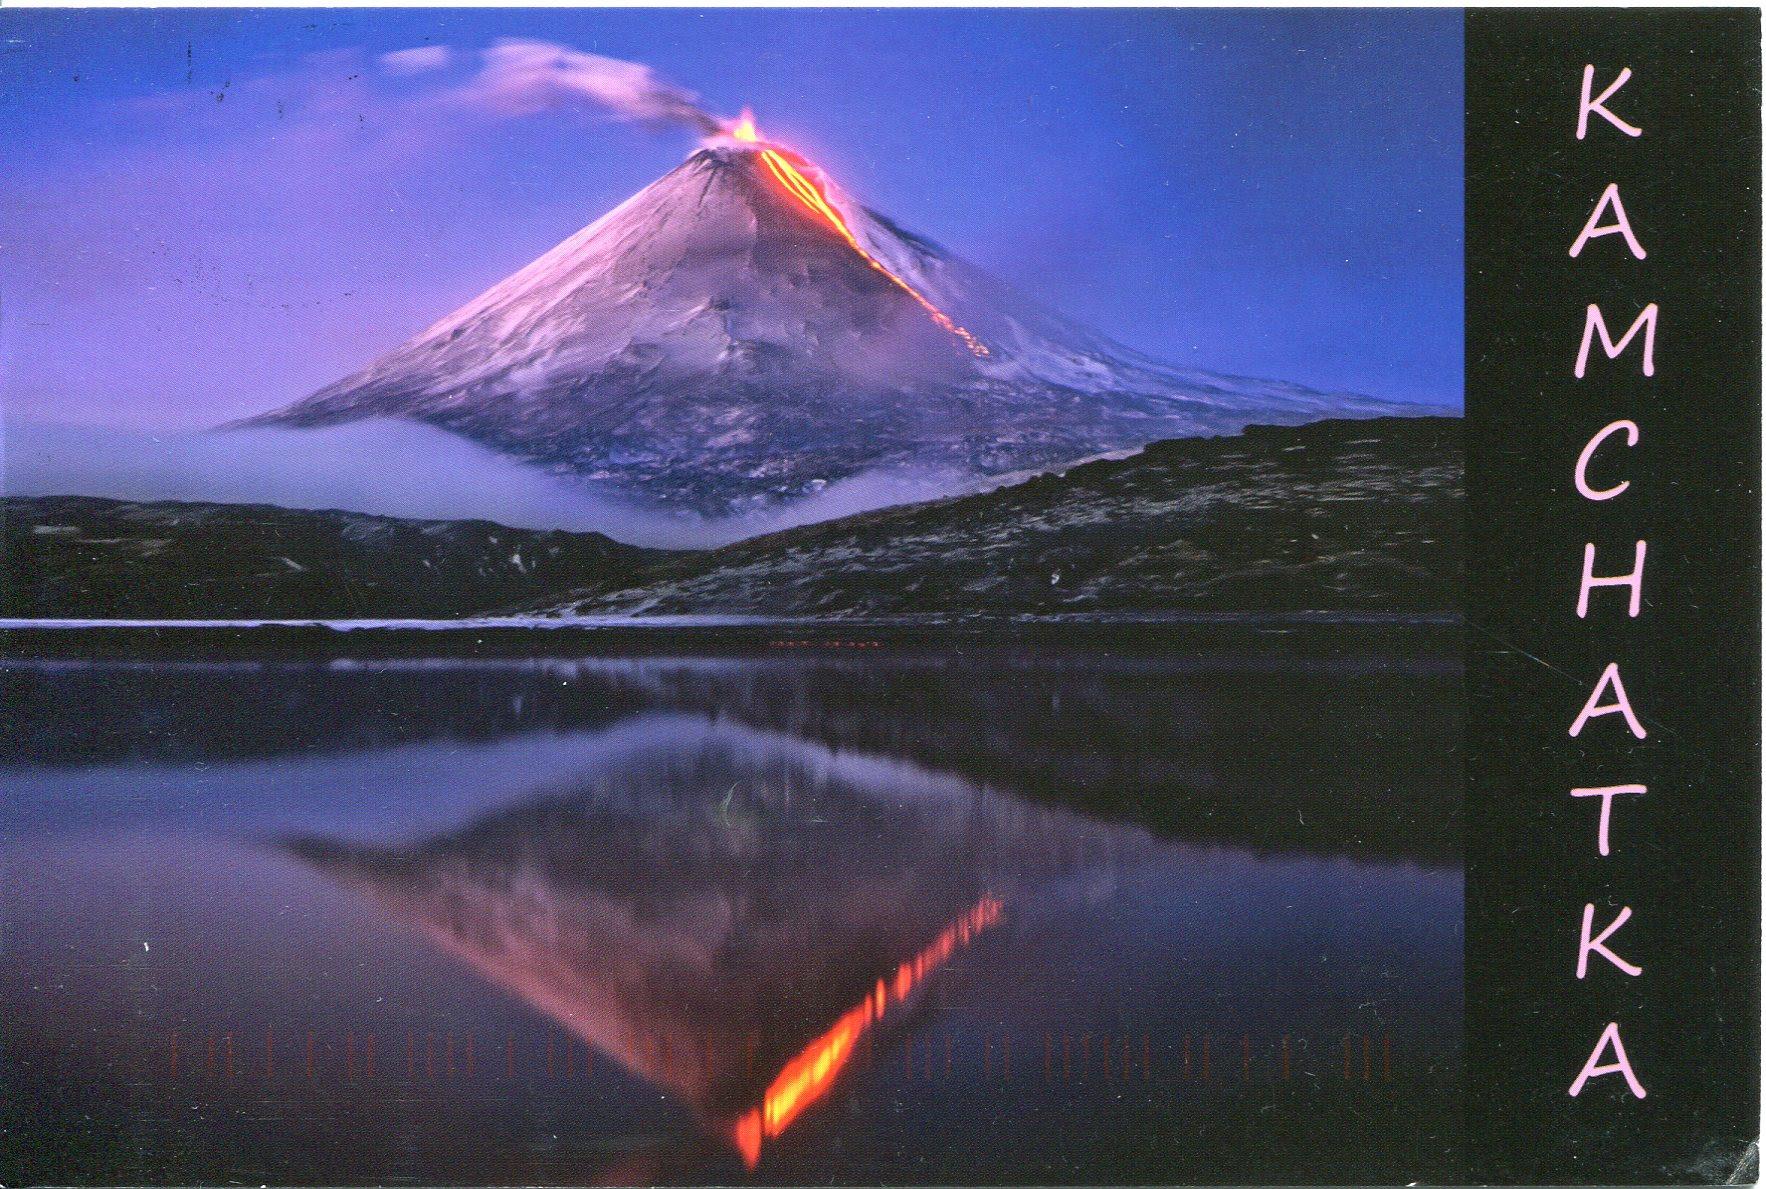 Kamchatka: Η Γη των ηφαιστείων